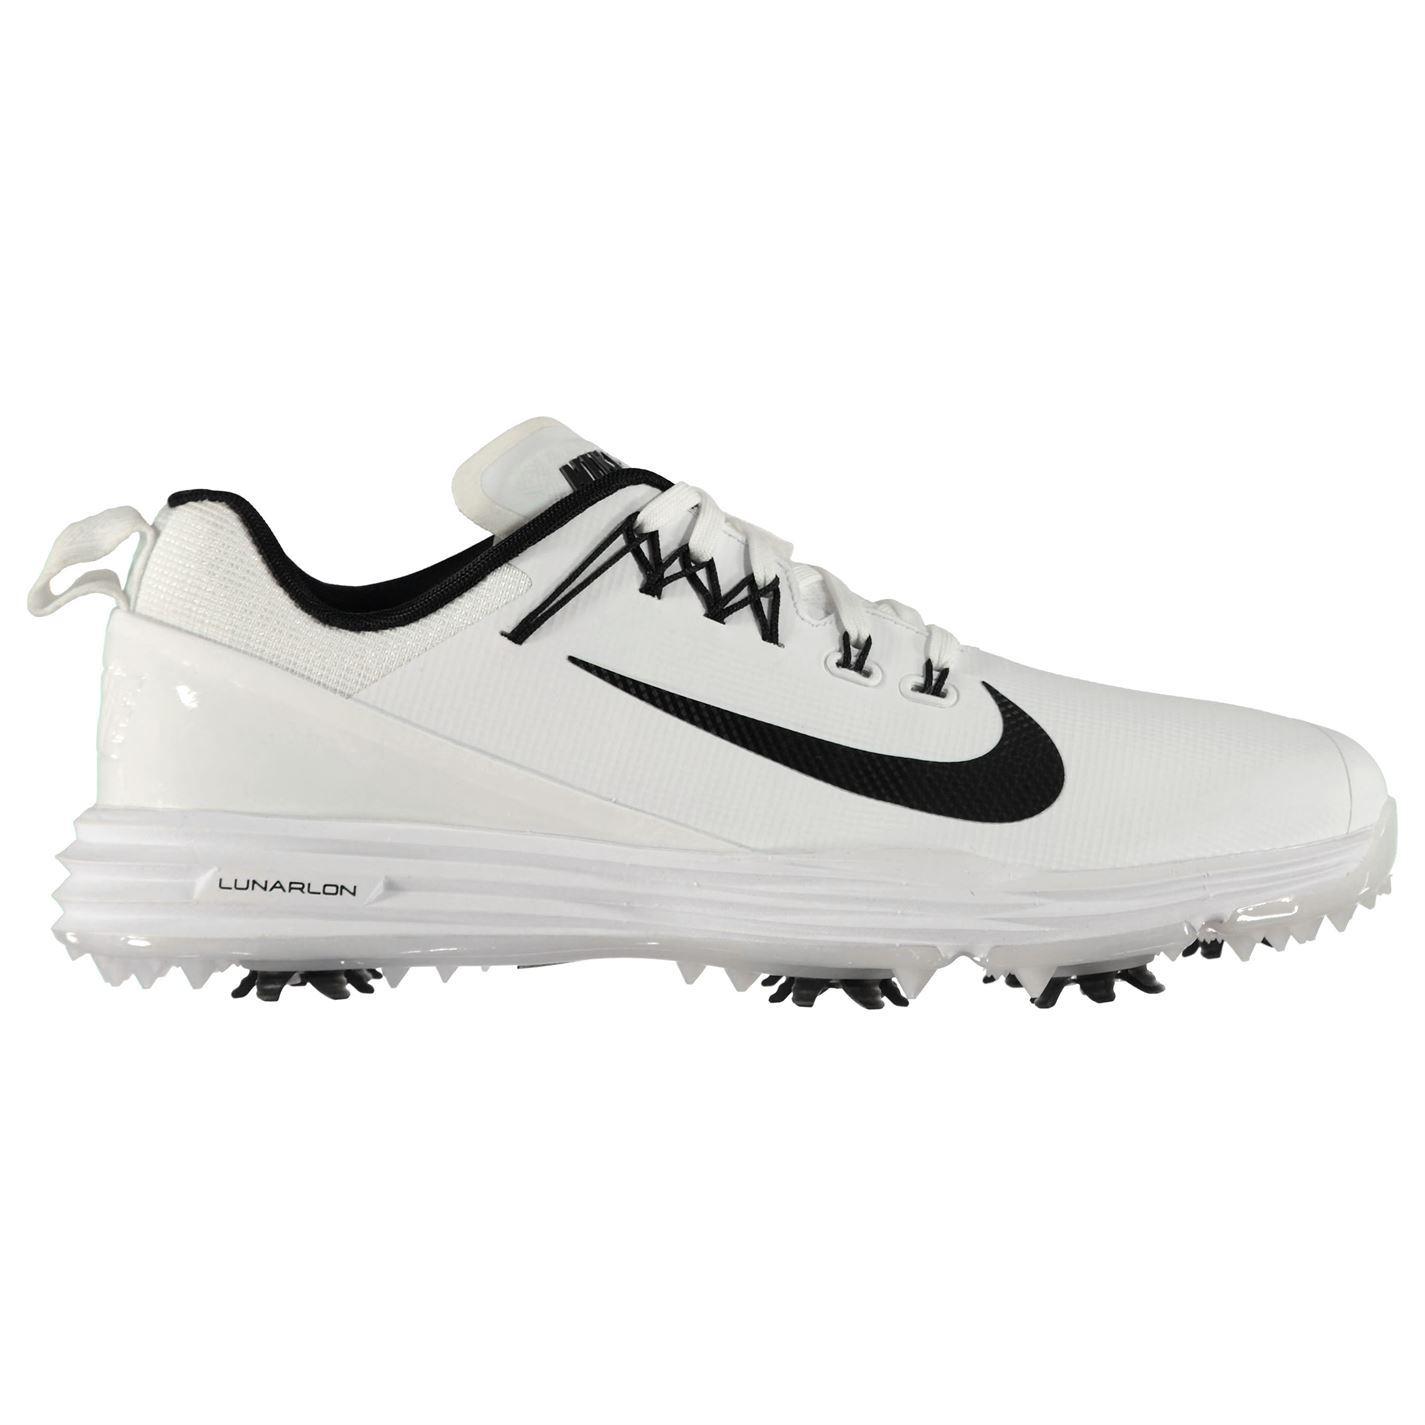 3688a5e6094a0 Nike Lunar Command 2 Golf Shoes LadiesSpikes Trainers Footwear | eBay